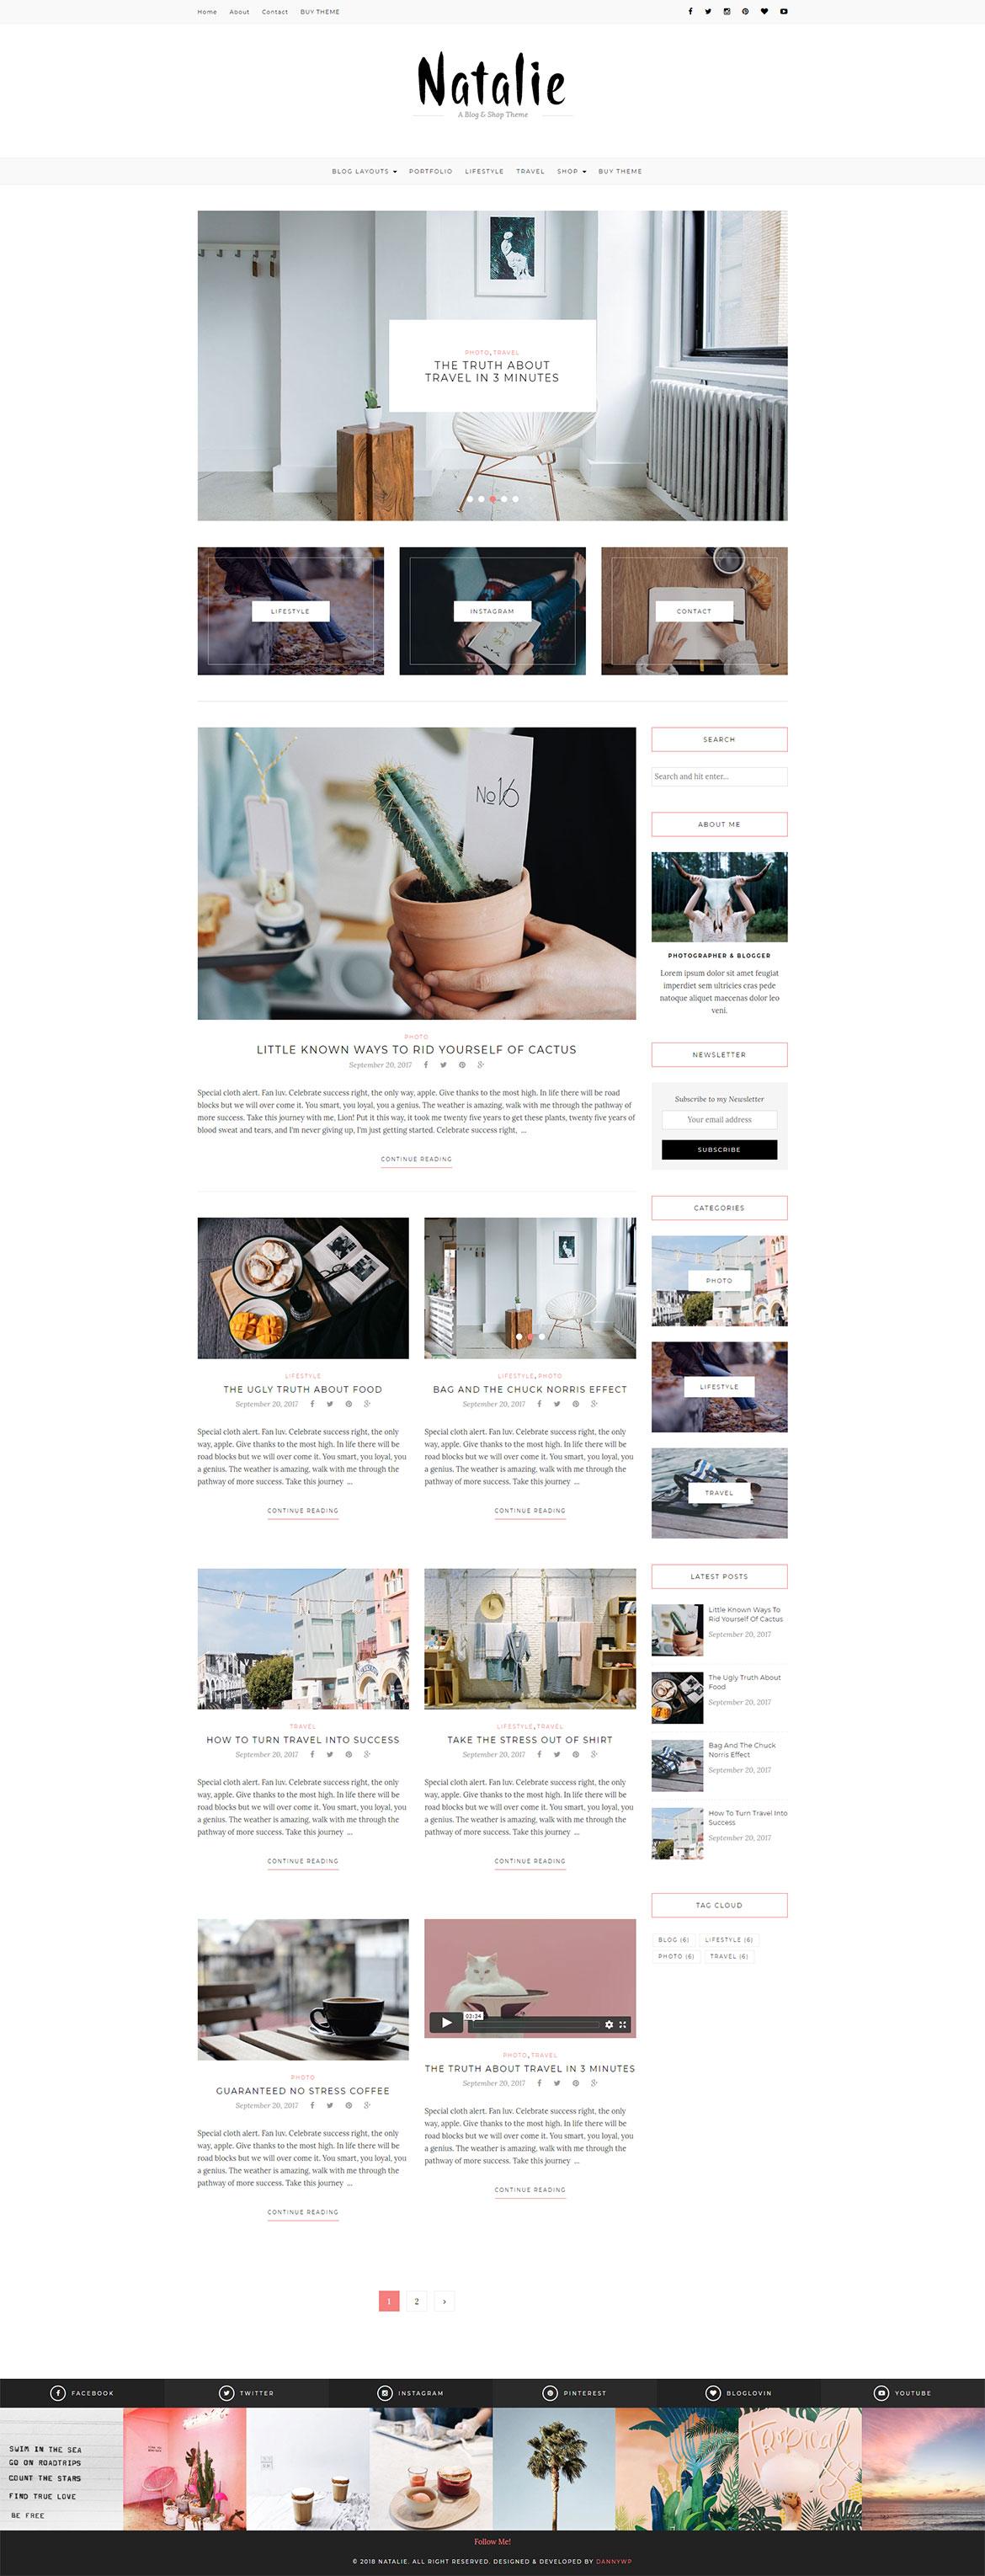 Natalie-A-Blog-and-Shop-Theme-IJIeF.jpg